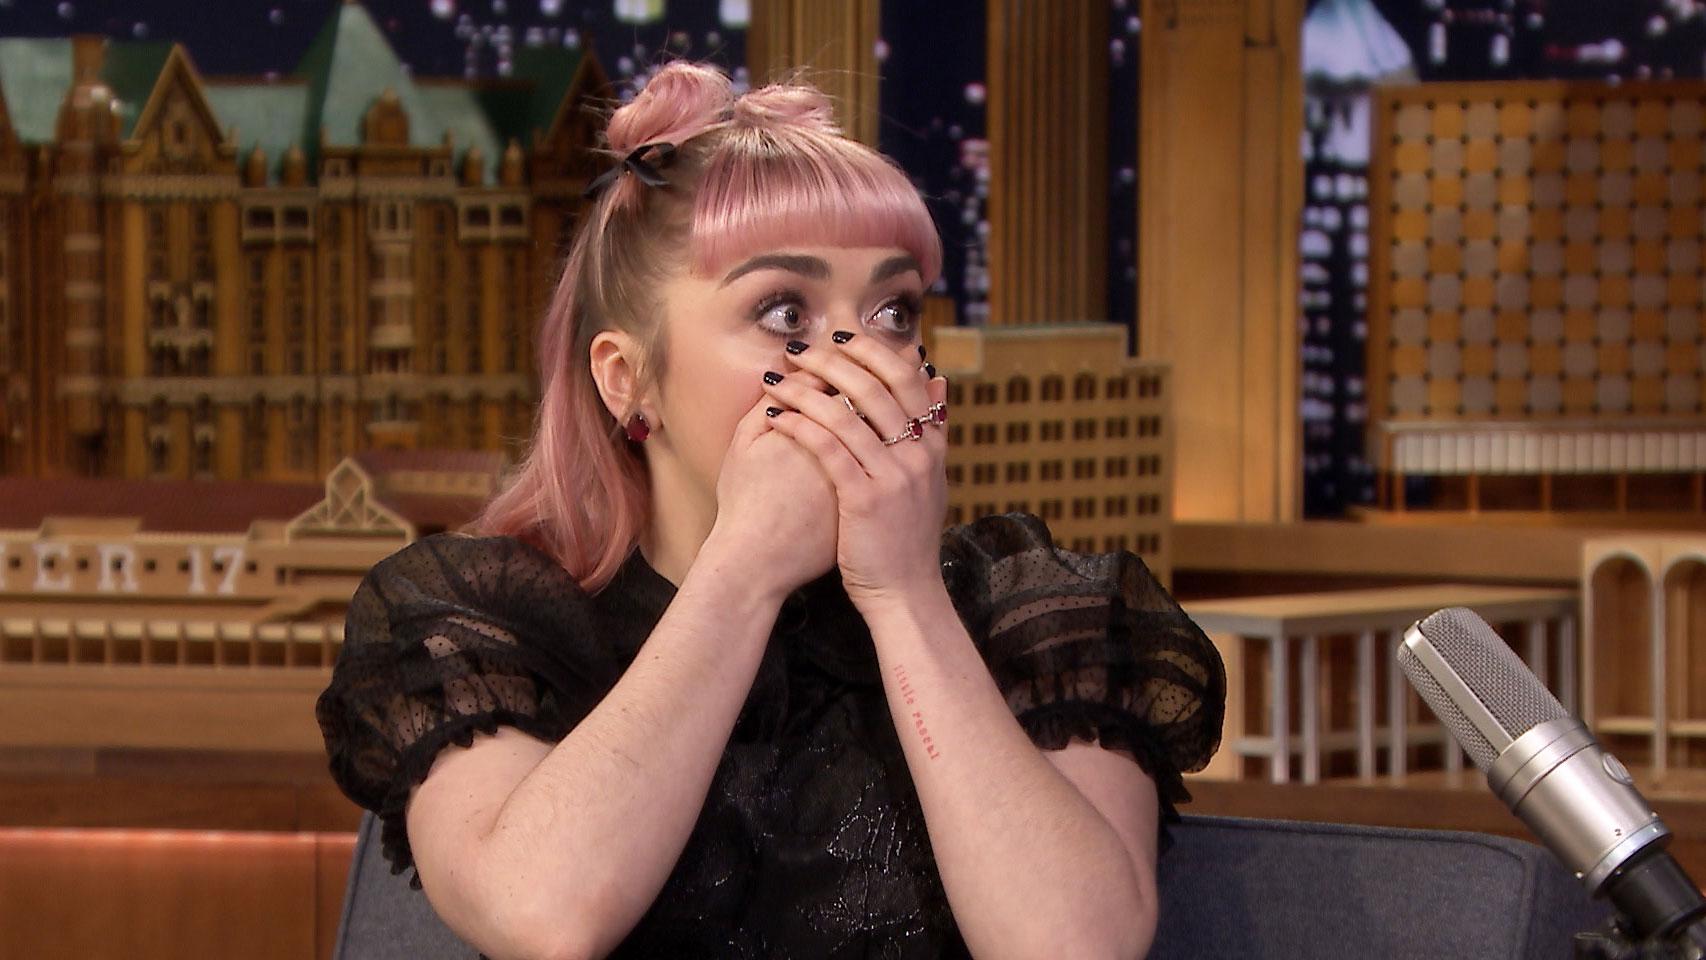 A shocked Maisie Williams